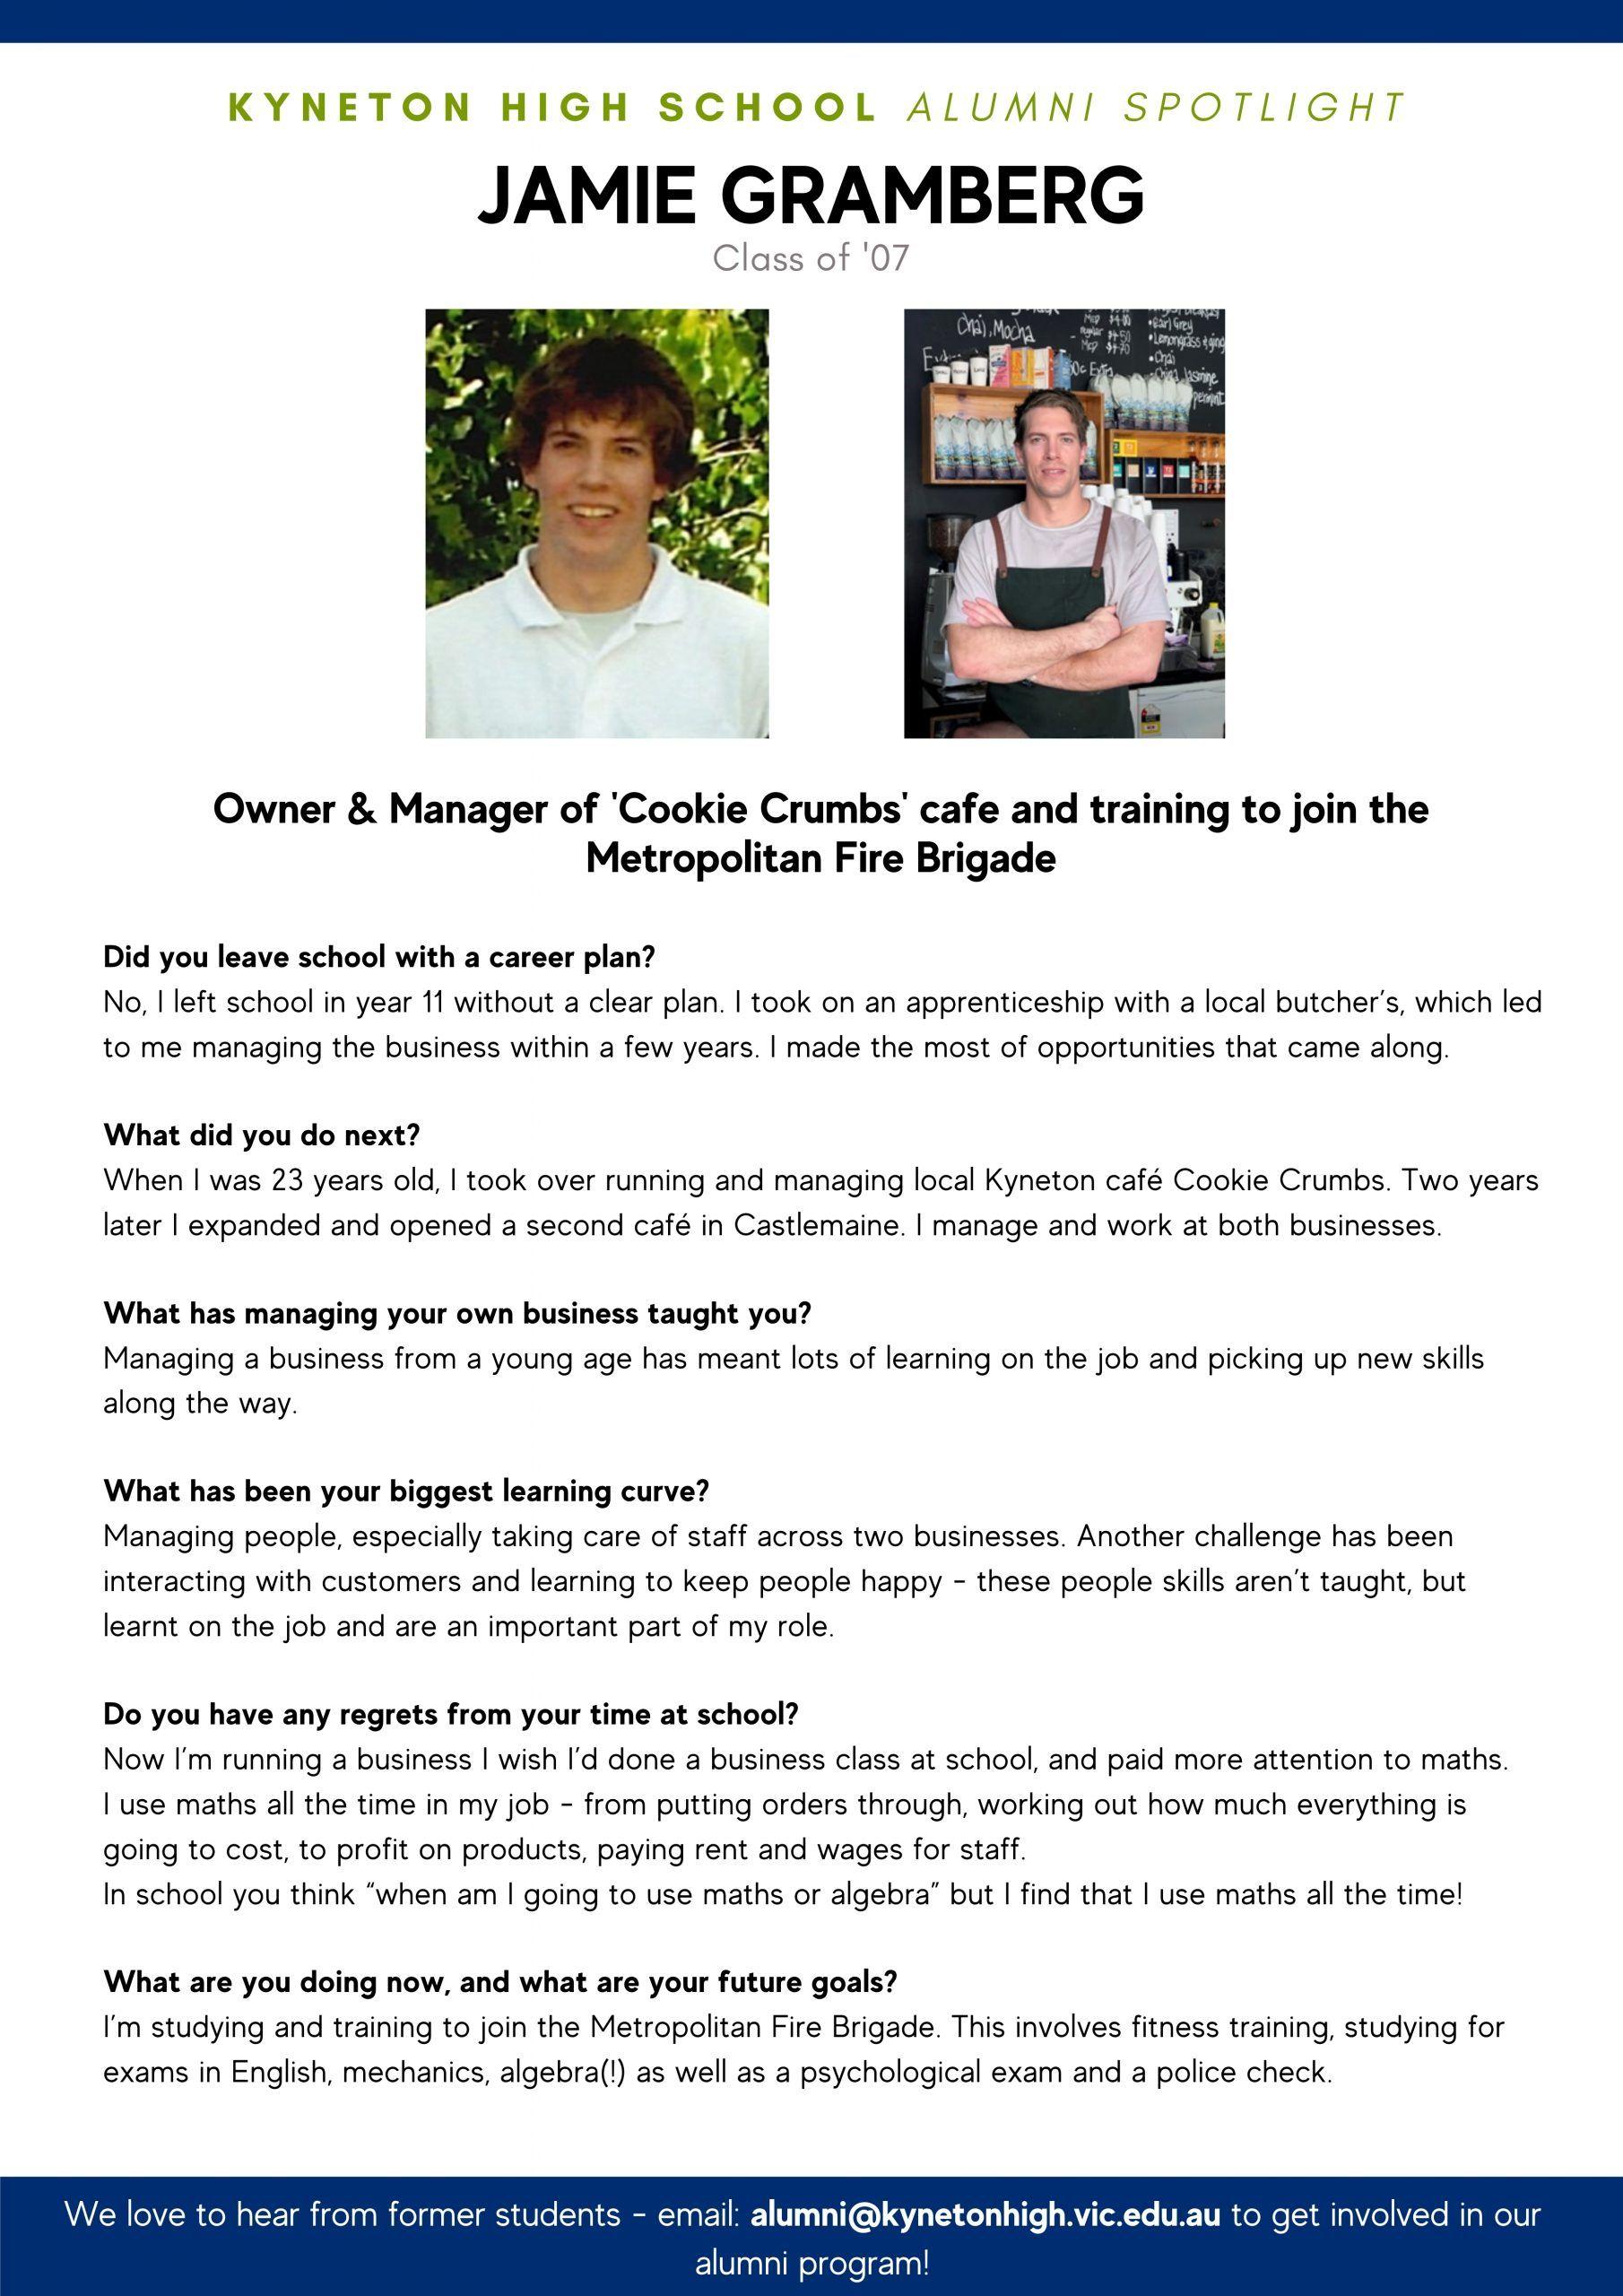 Alumni Spotlight Jamie Gramberg scaled - Kyneton High School - Excellence in Teaching & Learning